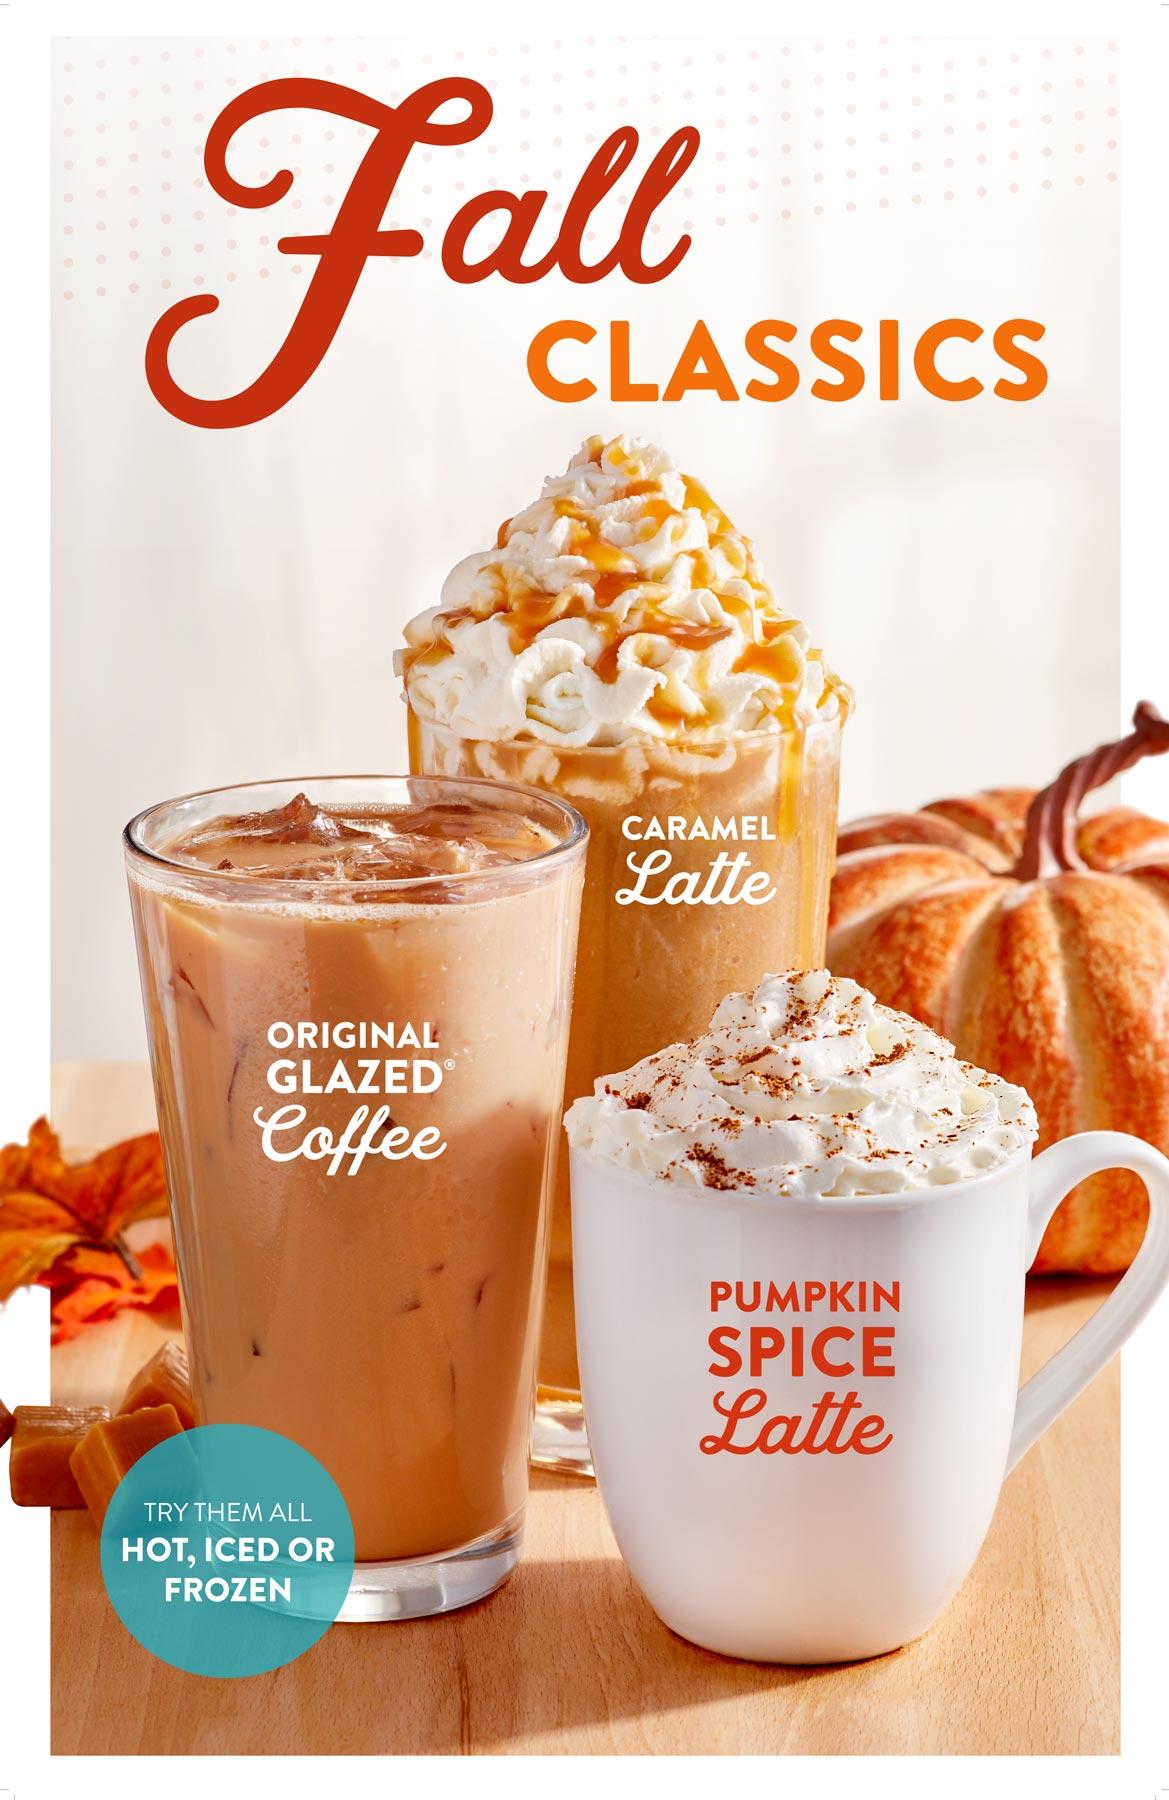 Krispy Kreme Doughnuts Fall Beverage Tear Sheet by Salt Paper Studio of Charlotte, NC